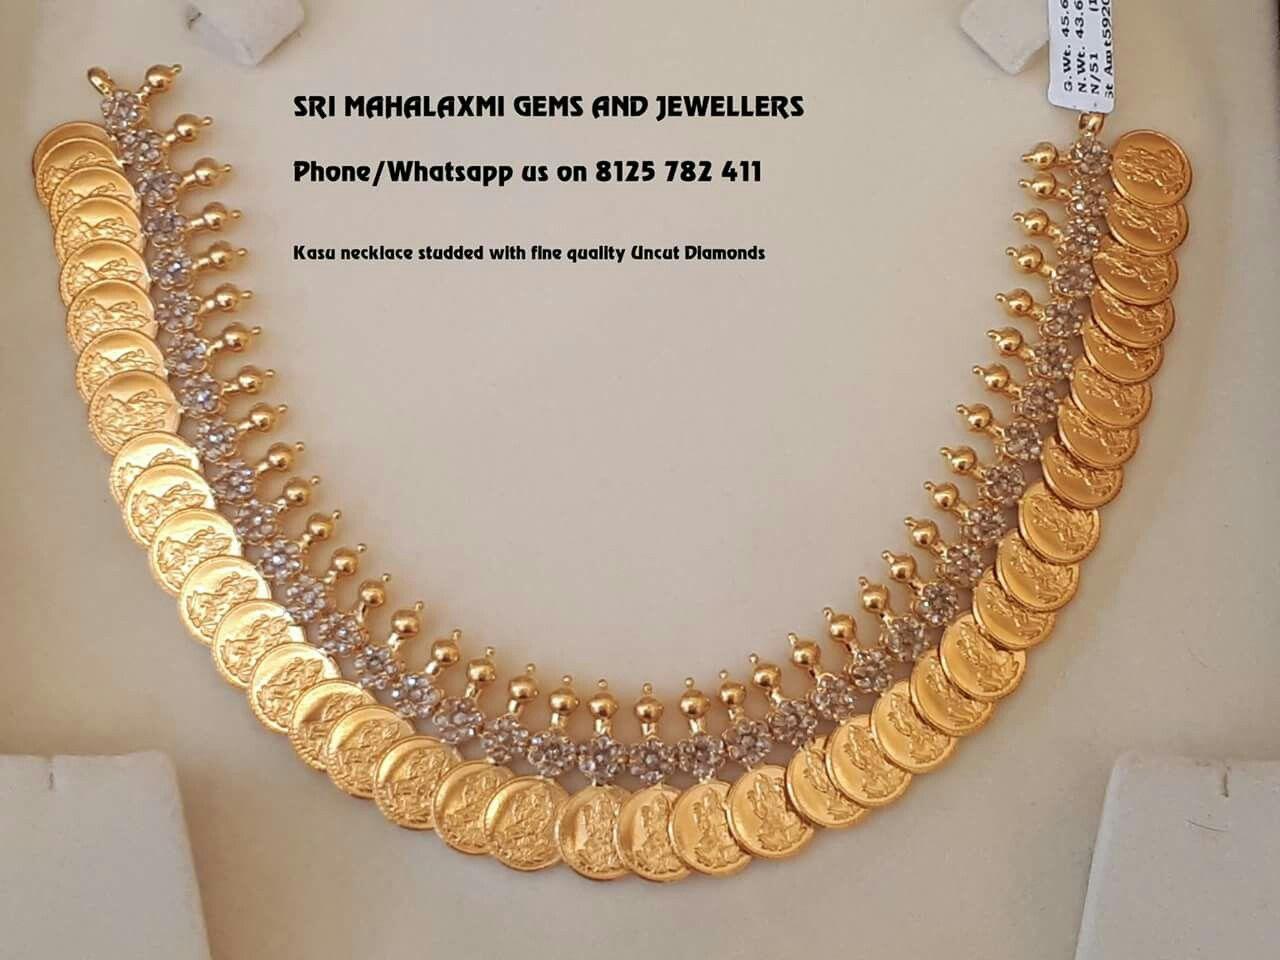 Pin by Madhavi Badri on Gold | Pinterest | Gold jewellery, Gold ...